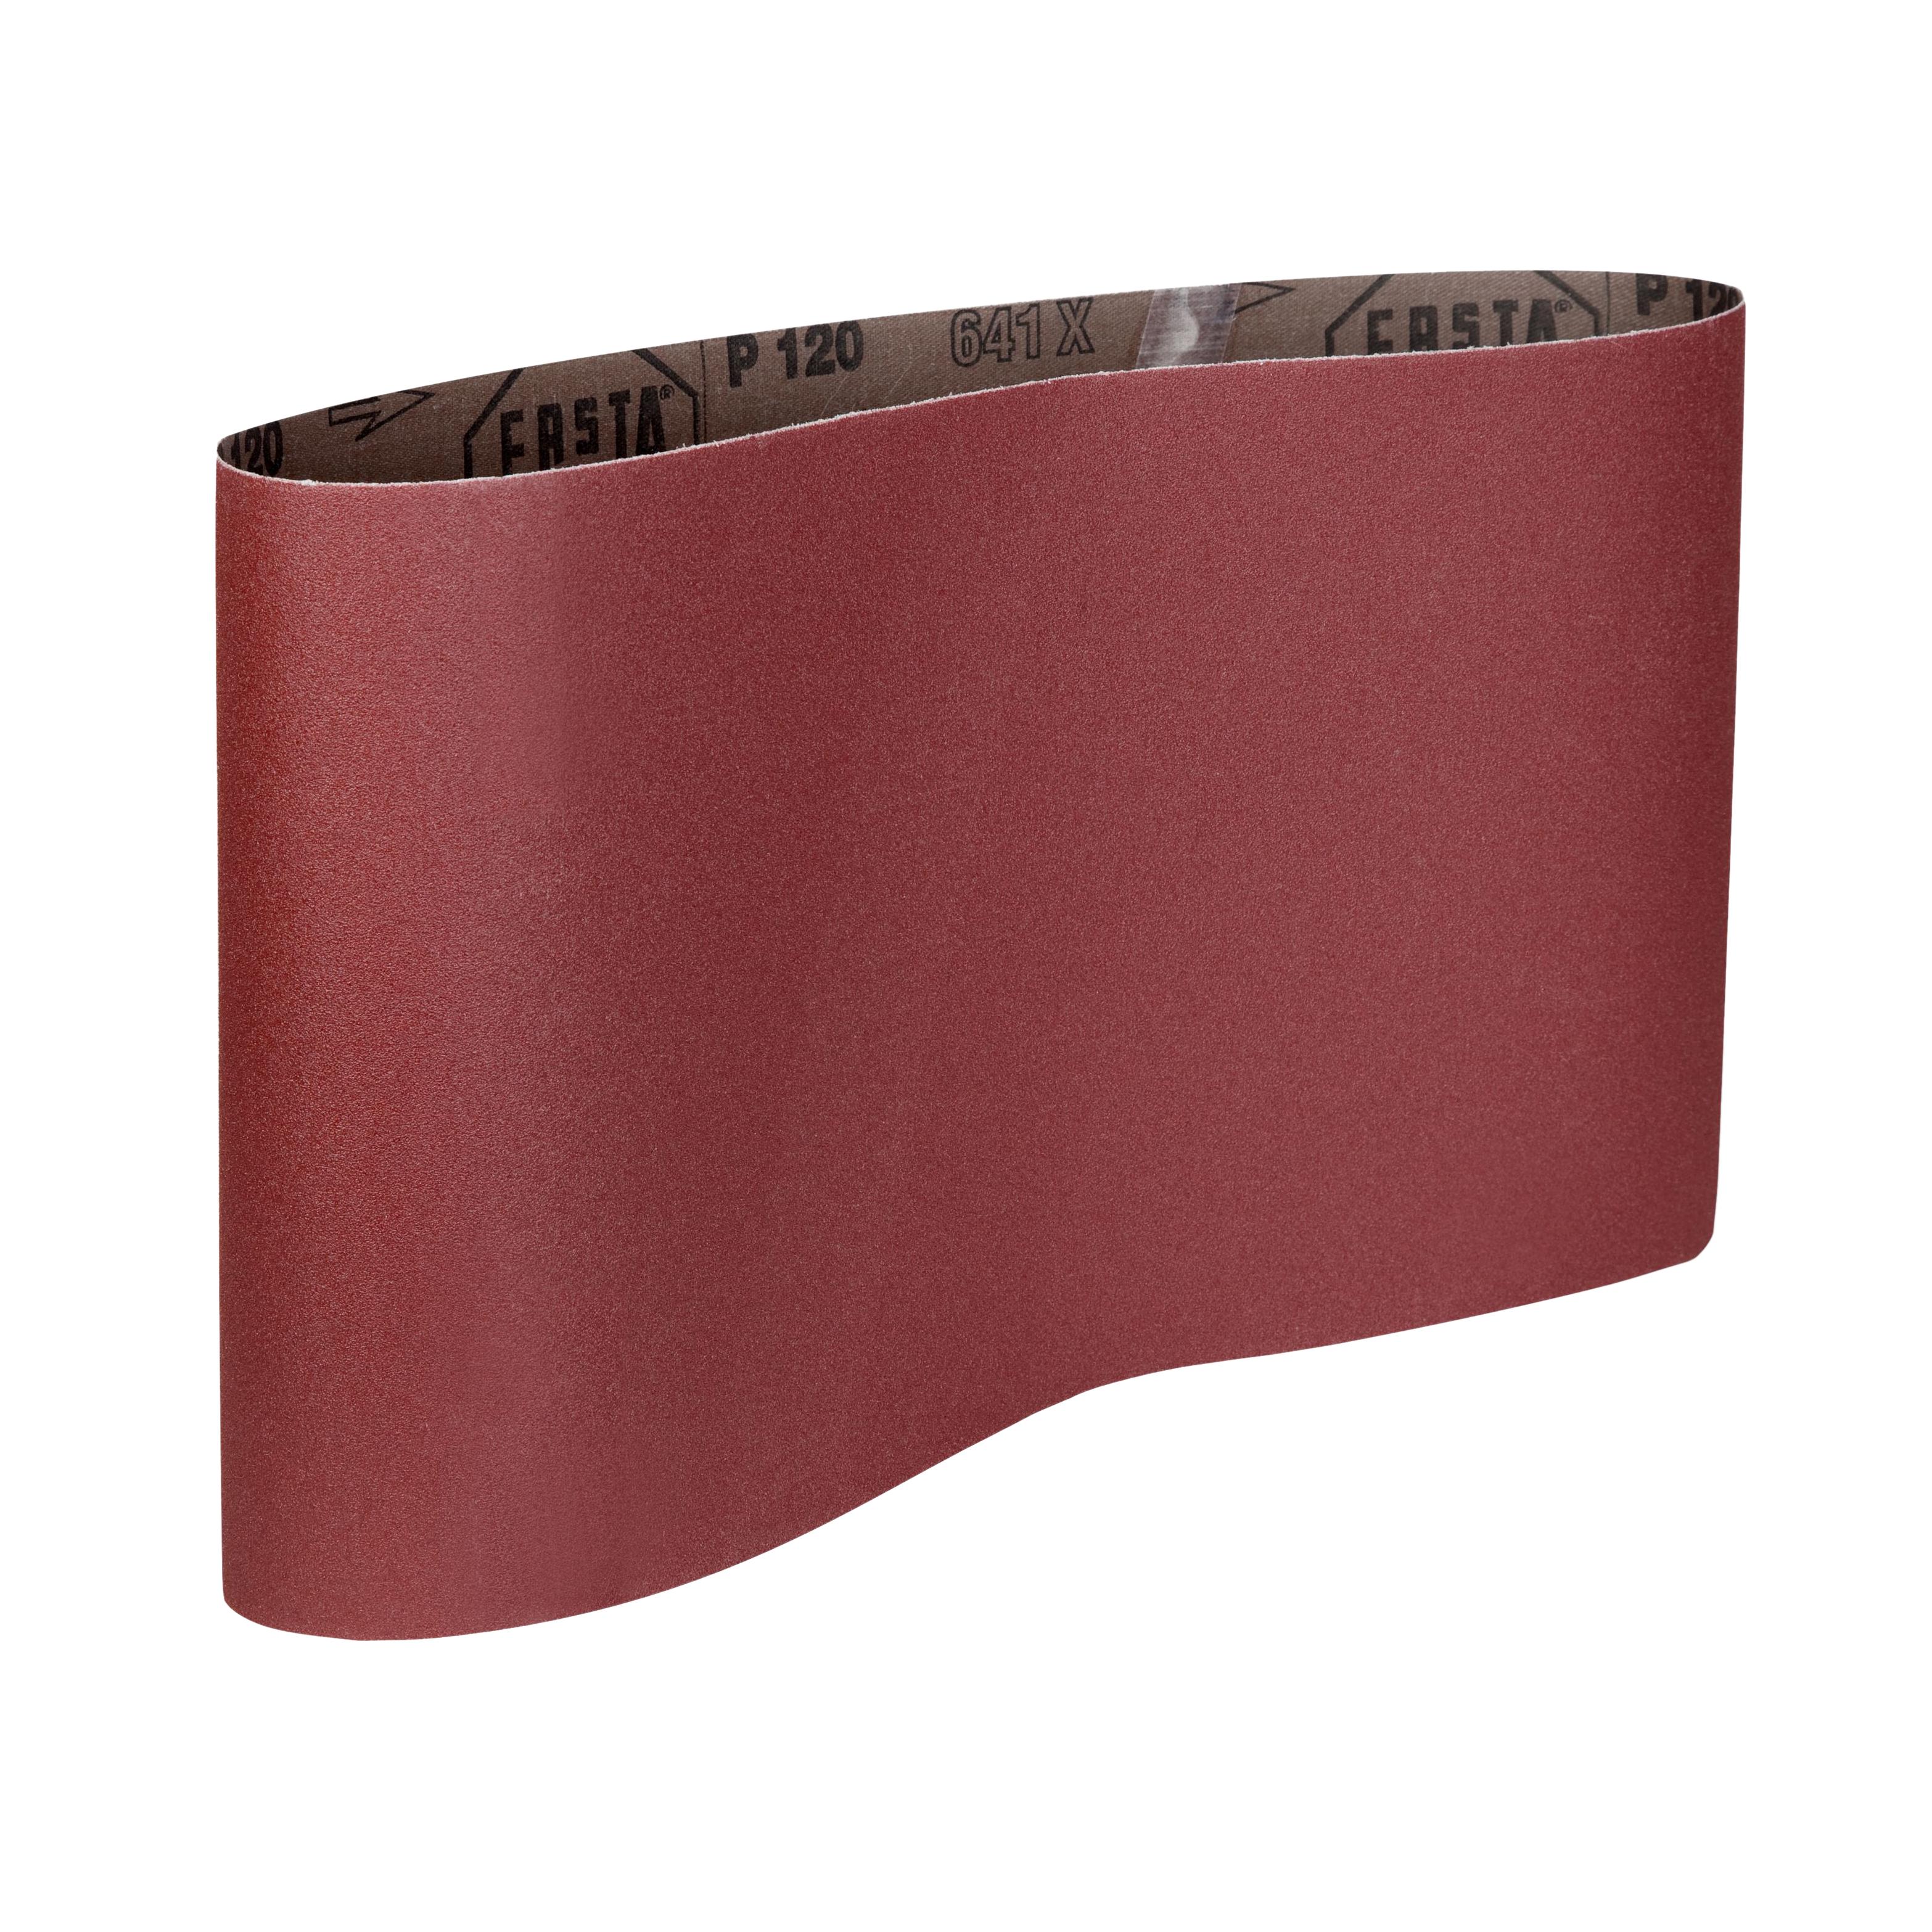 K 100 Parat Belts abrasive belt